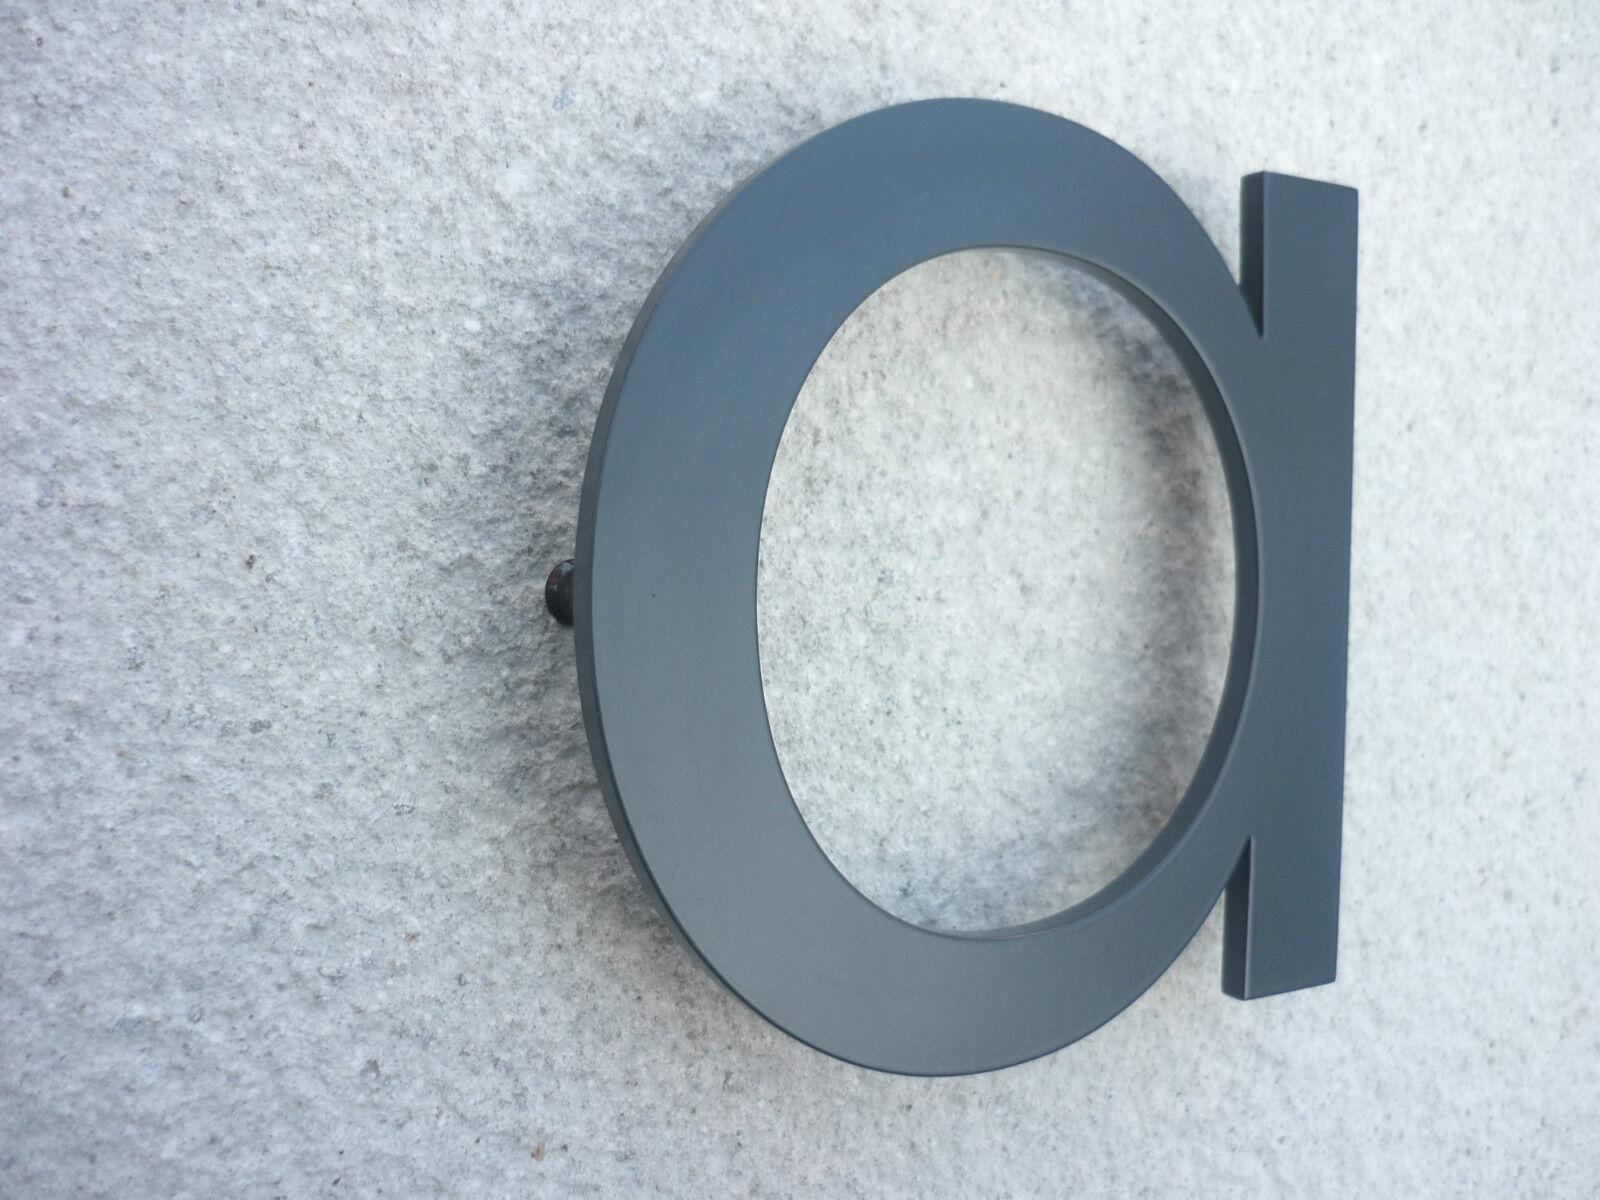 NEUTRAFACE Anthracite Aluminium Aluminium Aluminium Numéro De Maison PAIRE - 20cm - RAPIDE | La Conception Professionnelle  931c23